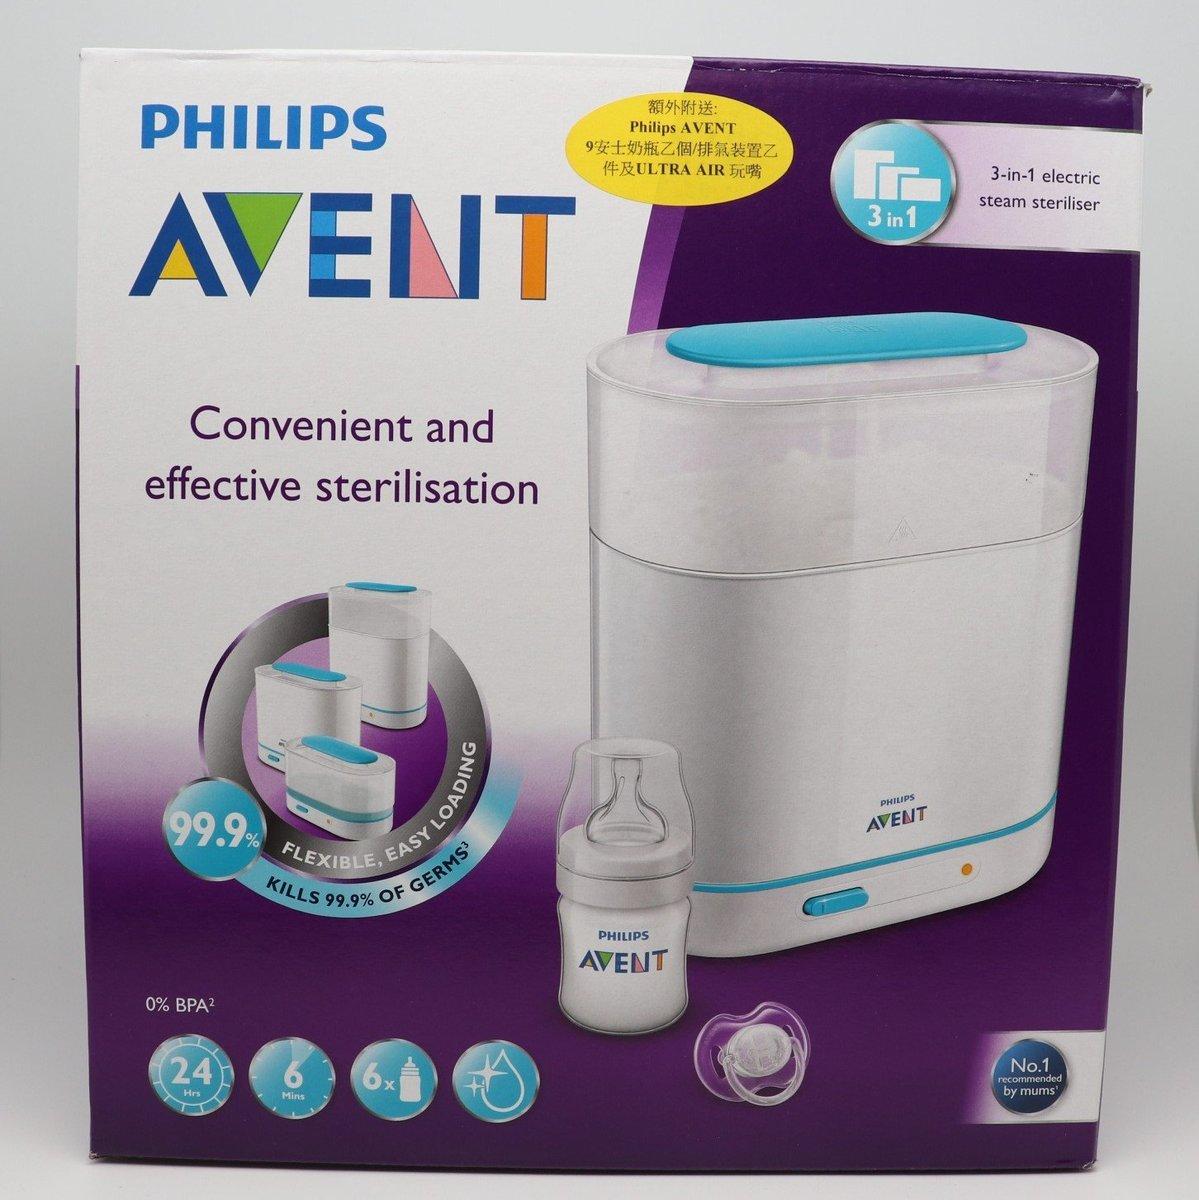 PHILIPS AVENT ~ 3 in 1 Steam Sterilizer